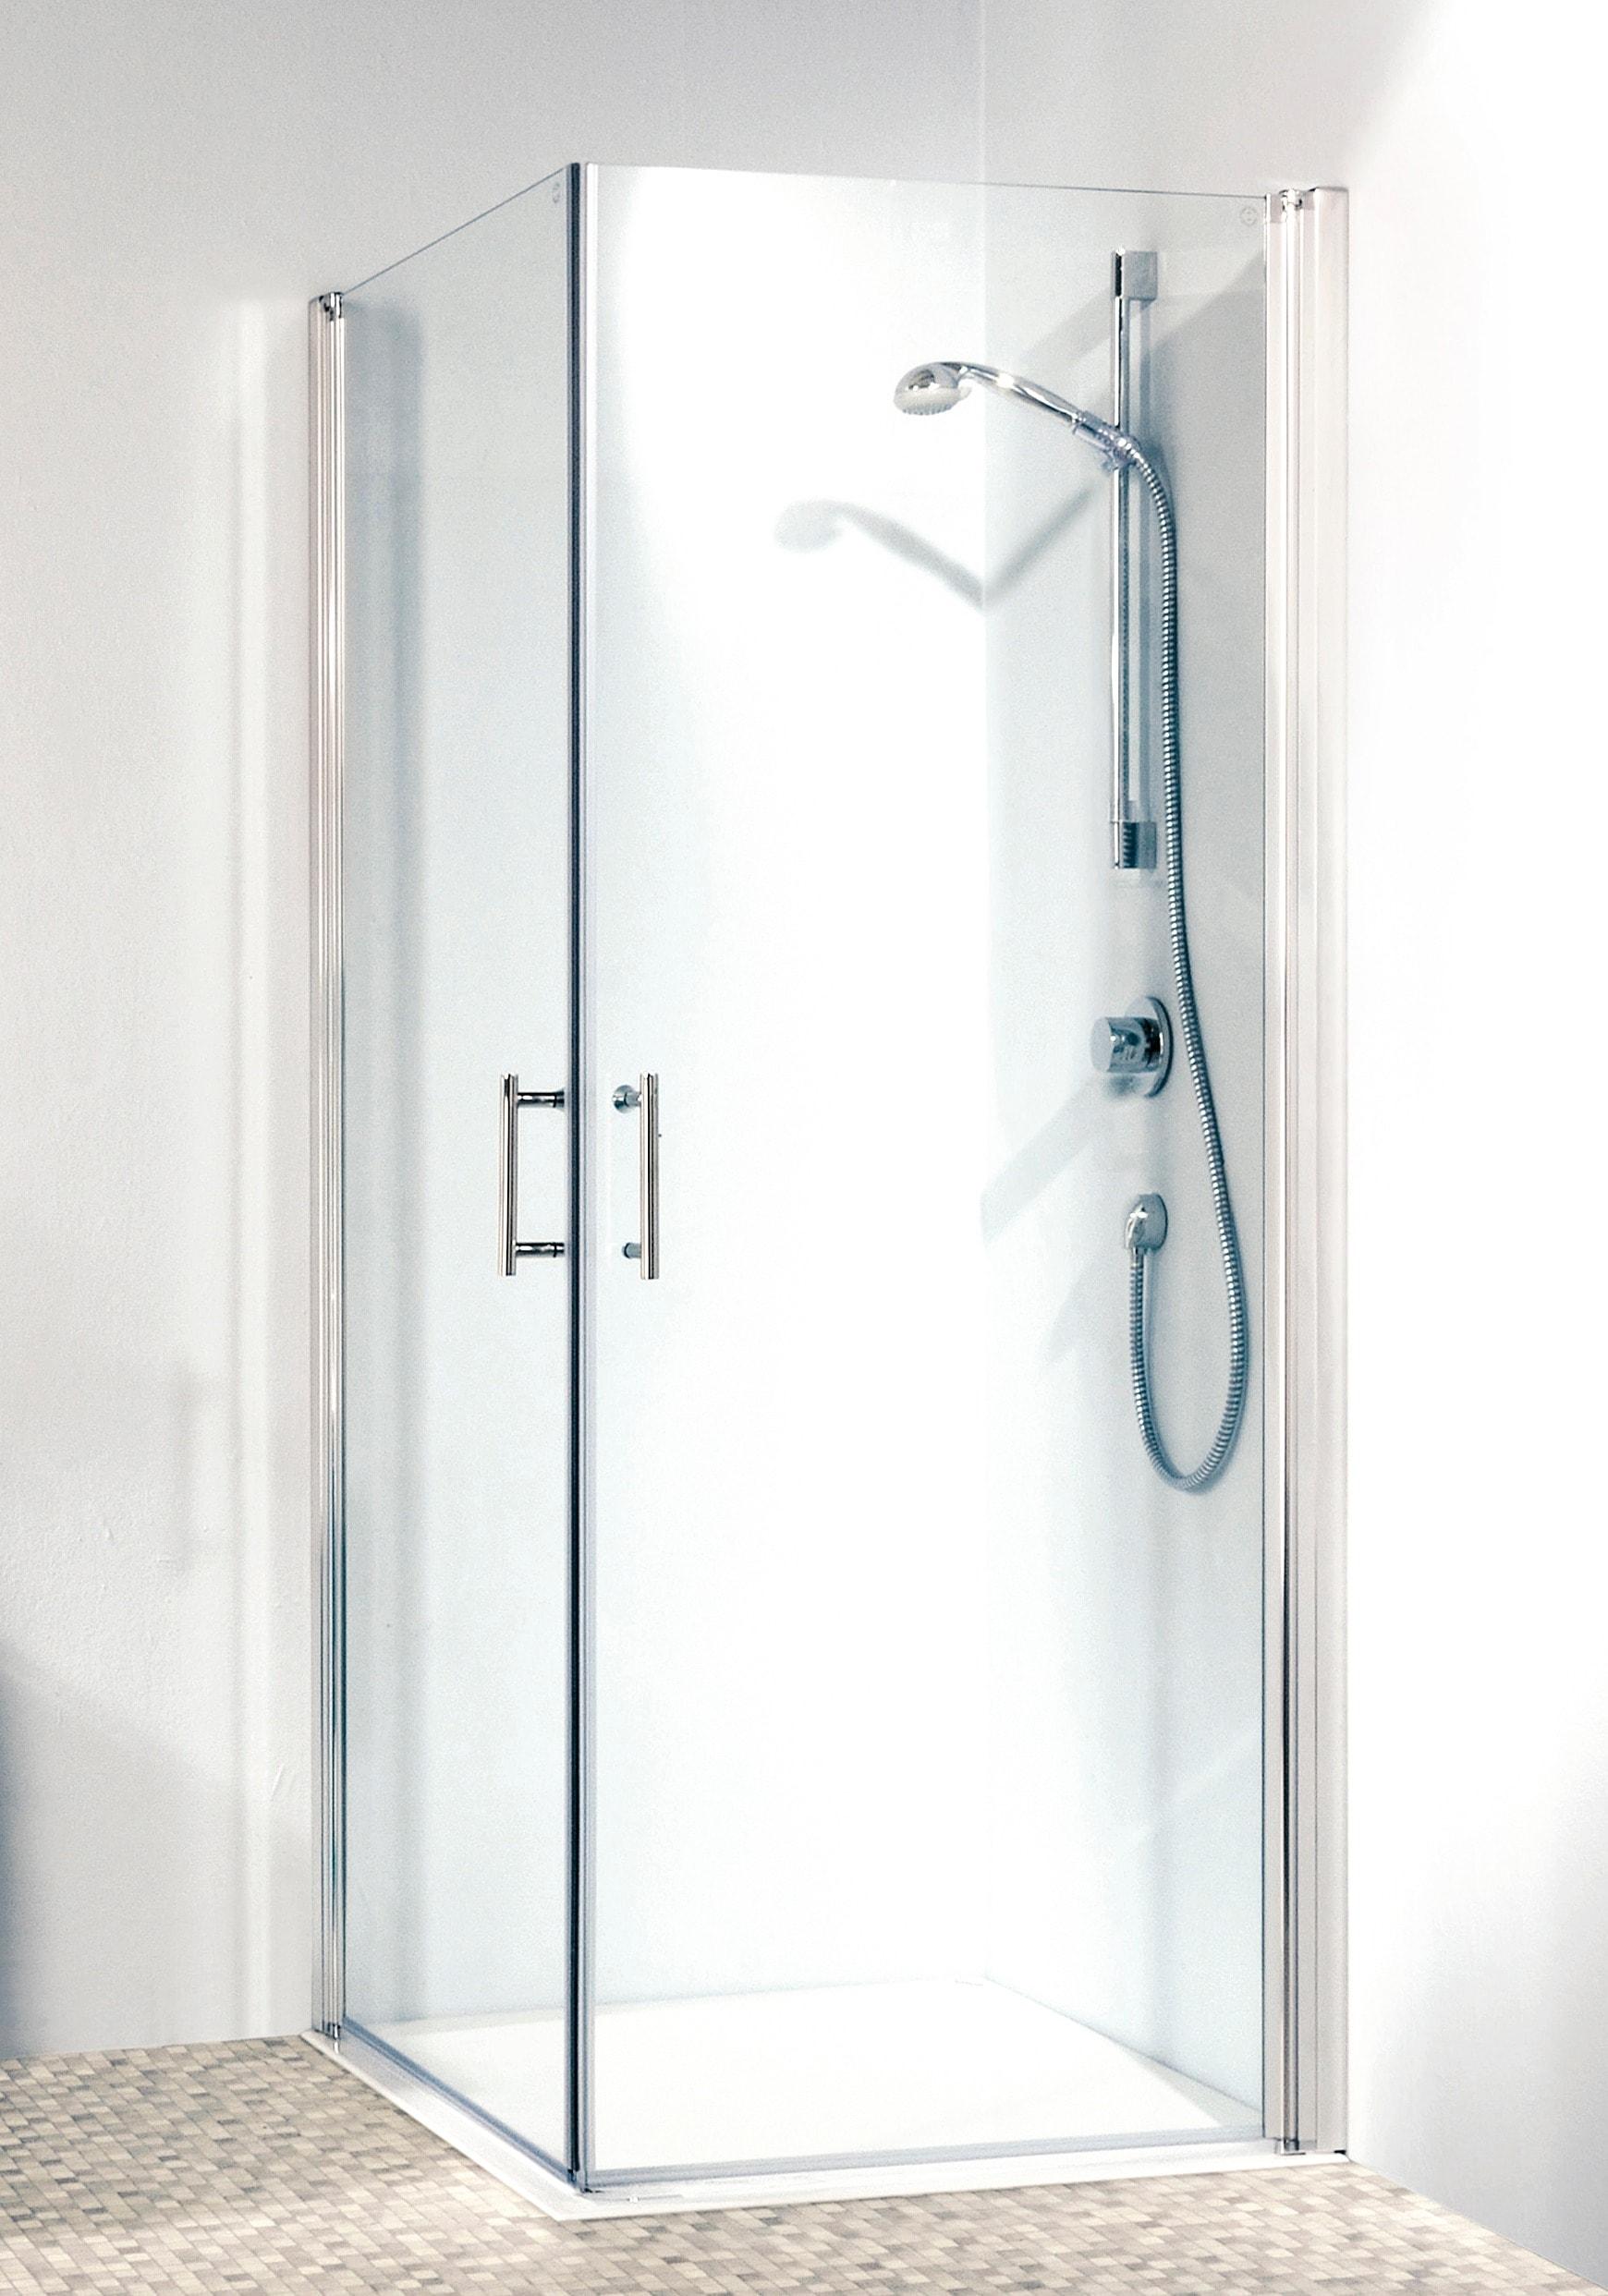 eckdusche relax per rechnung baur. Black Bedroom Furniture Sets. Home Design Ideas